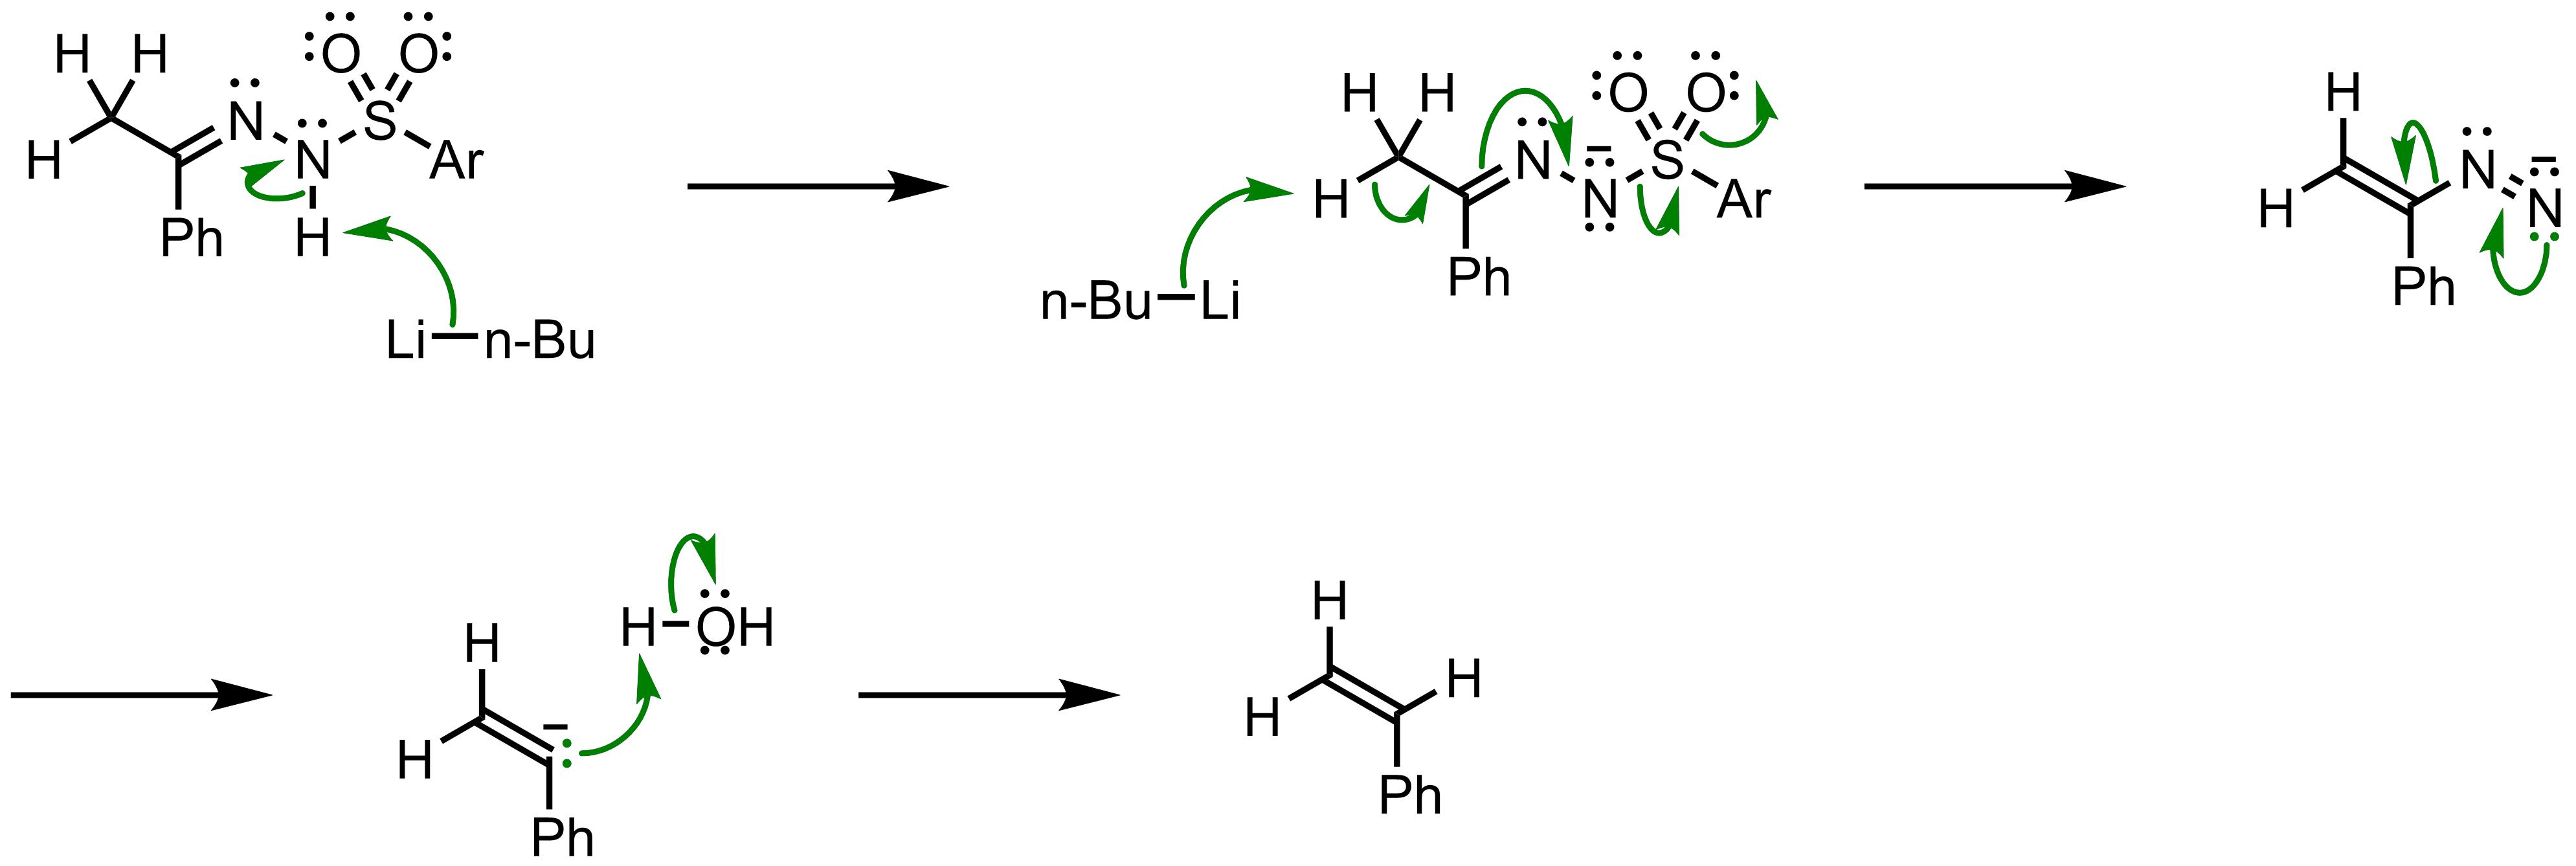 Mechanism of the Shapiro Reaction